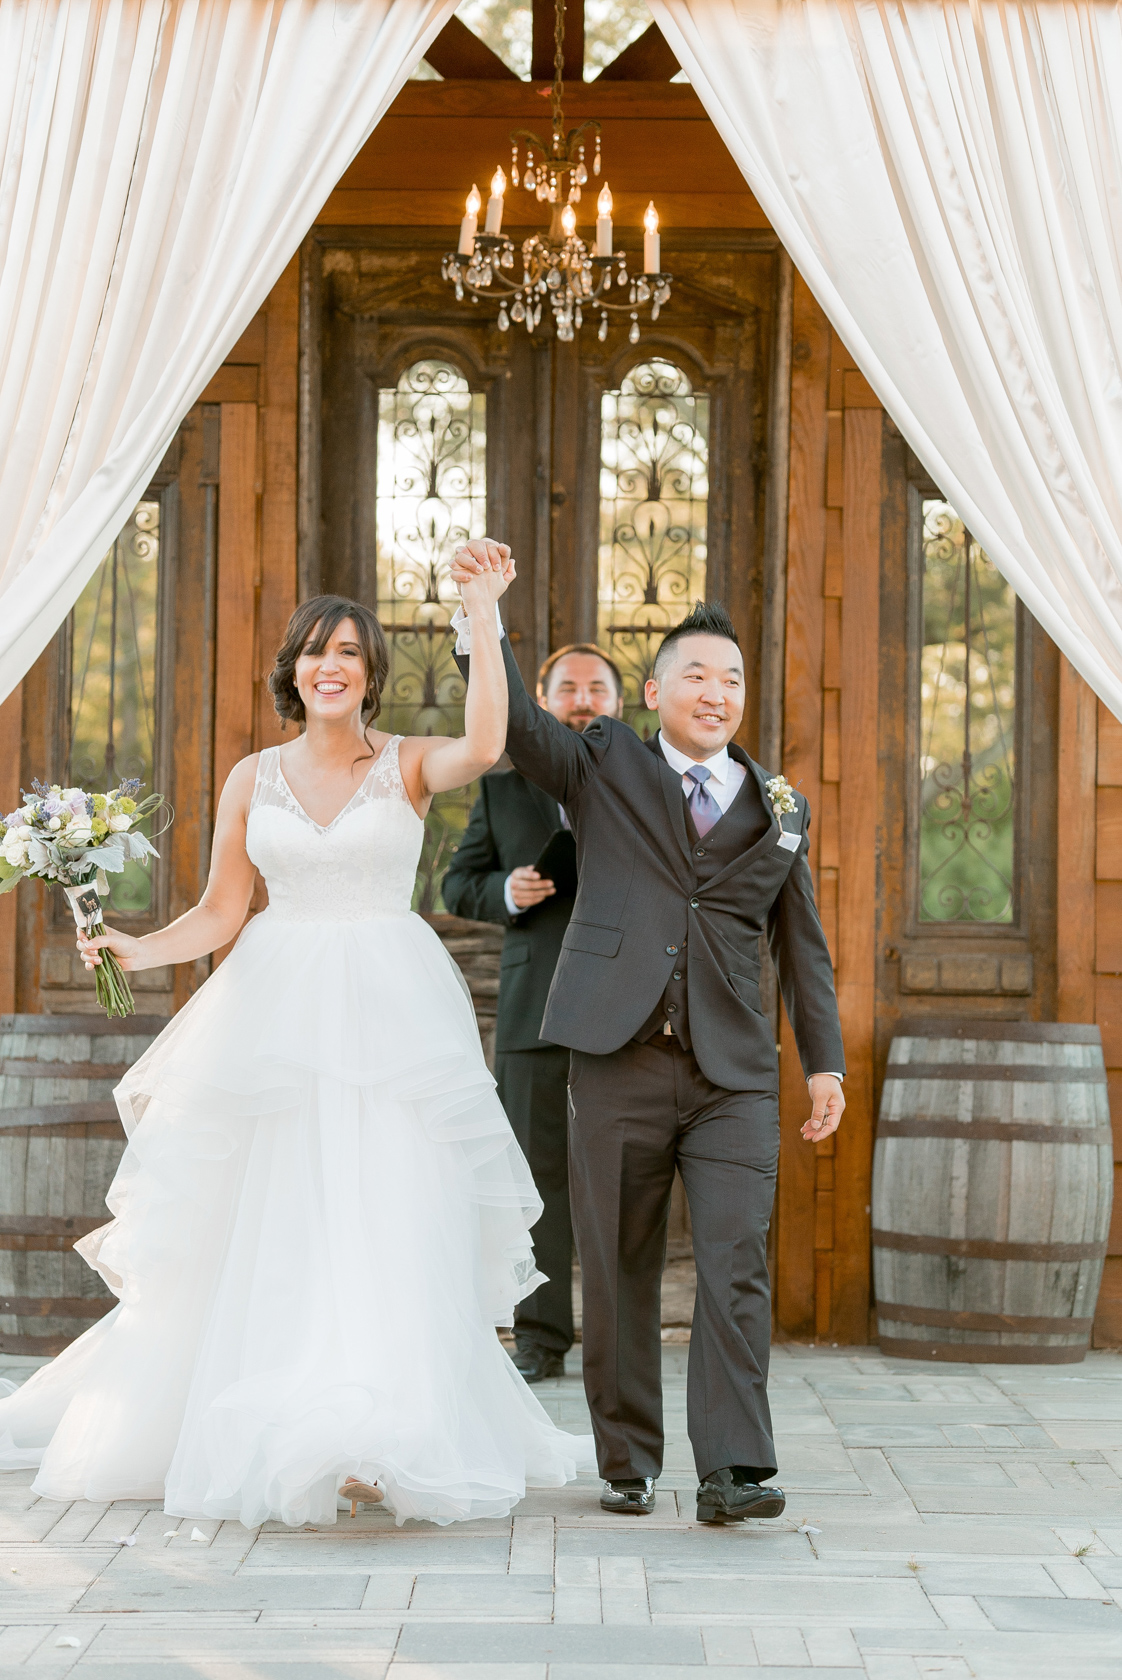 berry barn wedding ceremony - 06